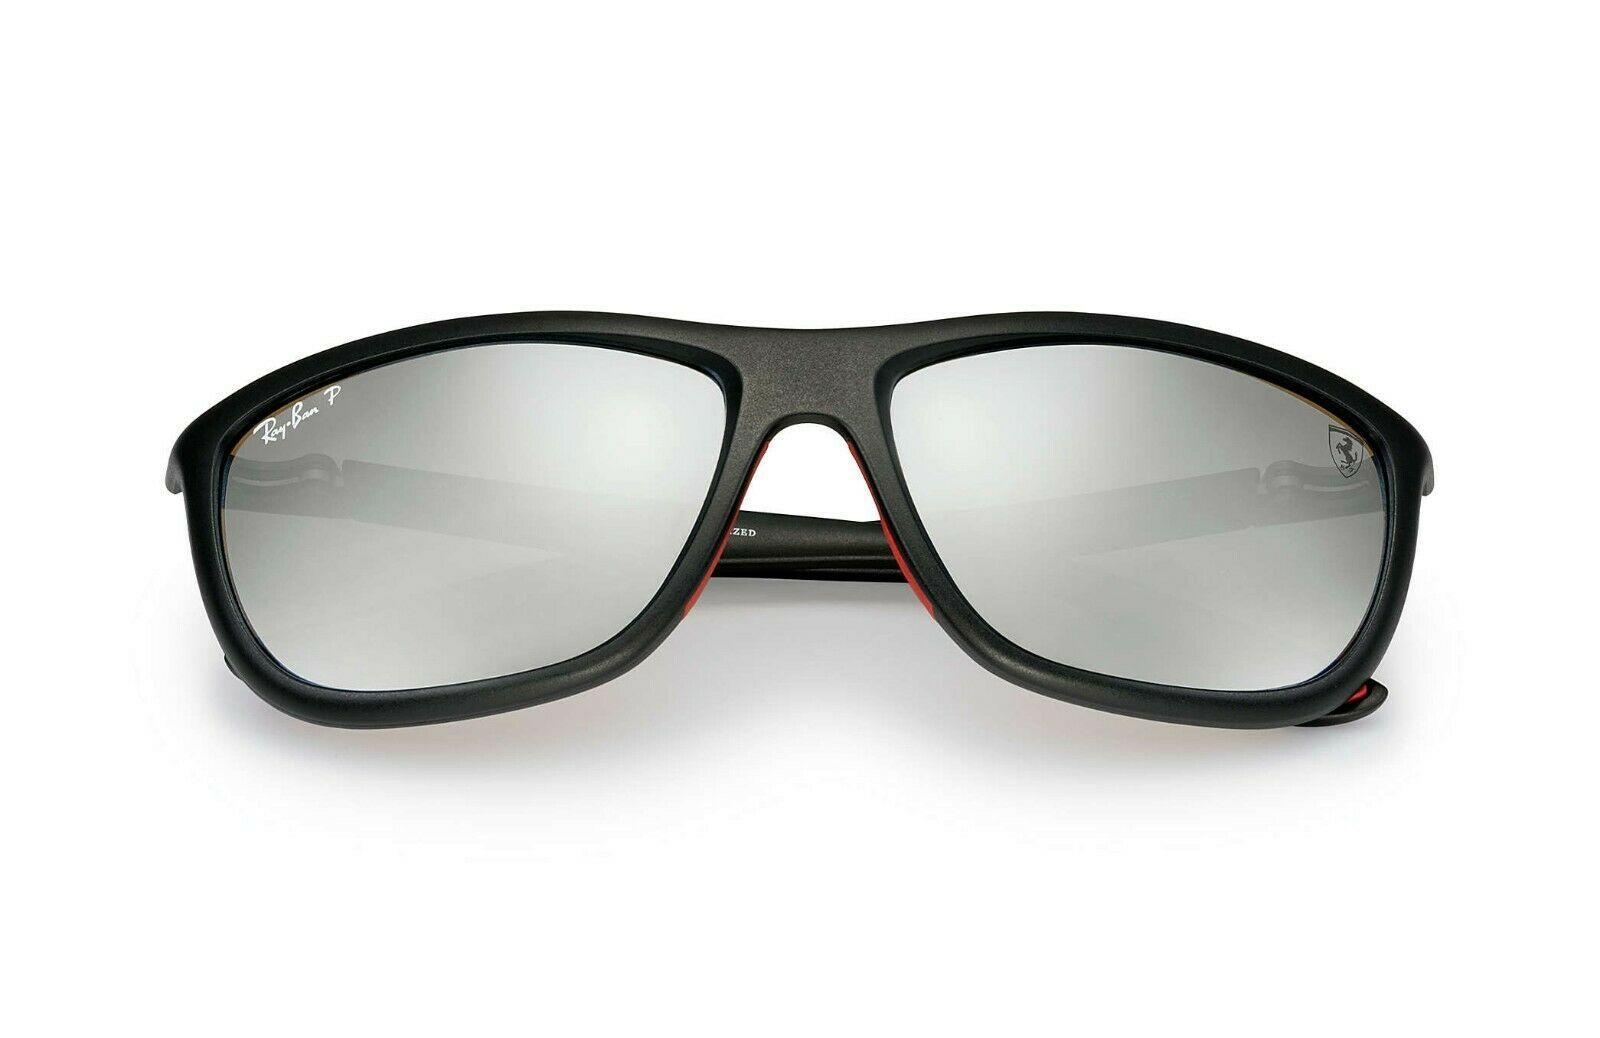 Ray Ban RB8351M F602H3 60 Ferrari Collection Sunglasses Black, Polarized Silver